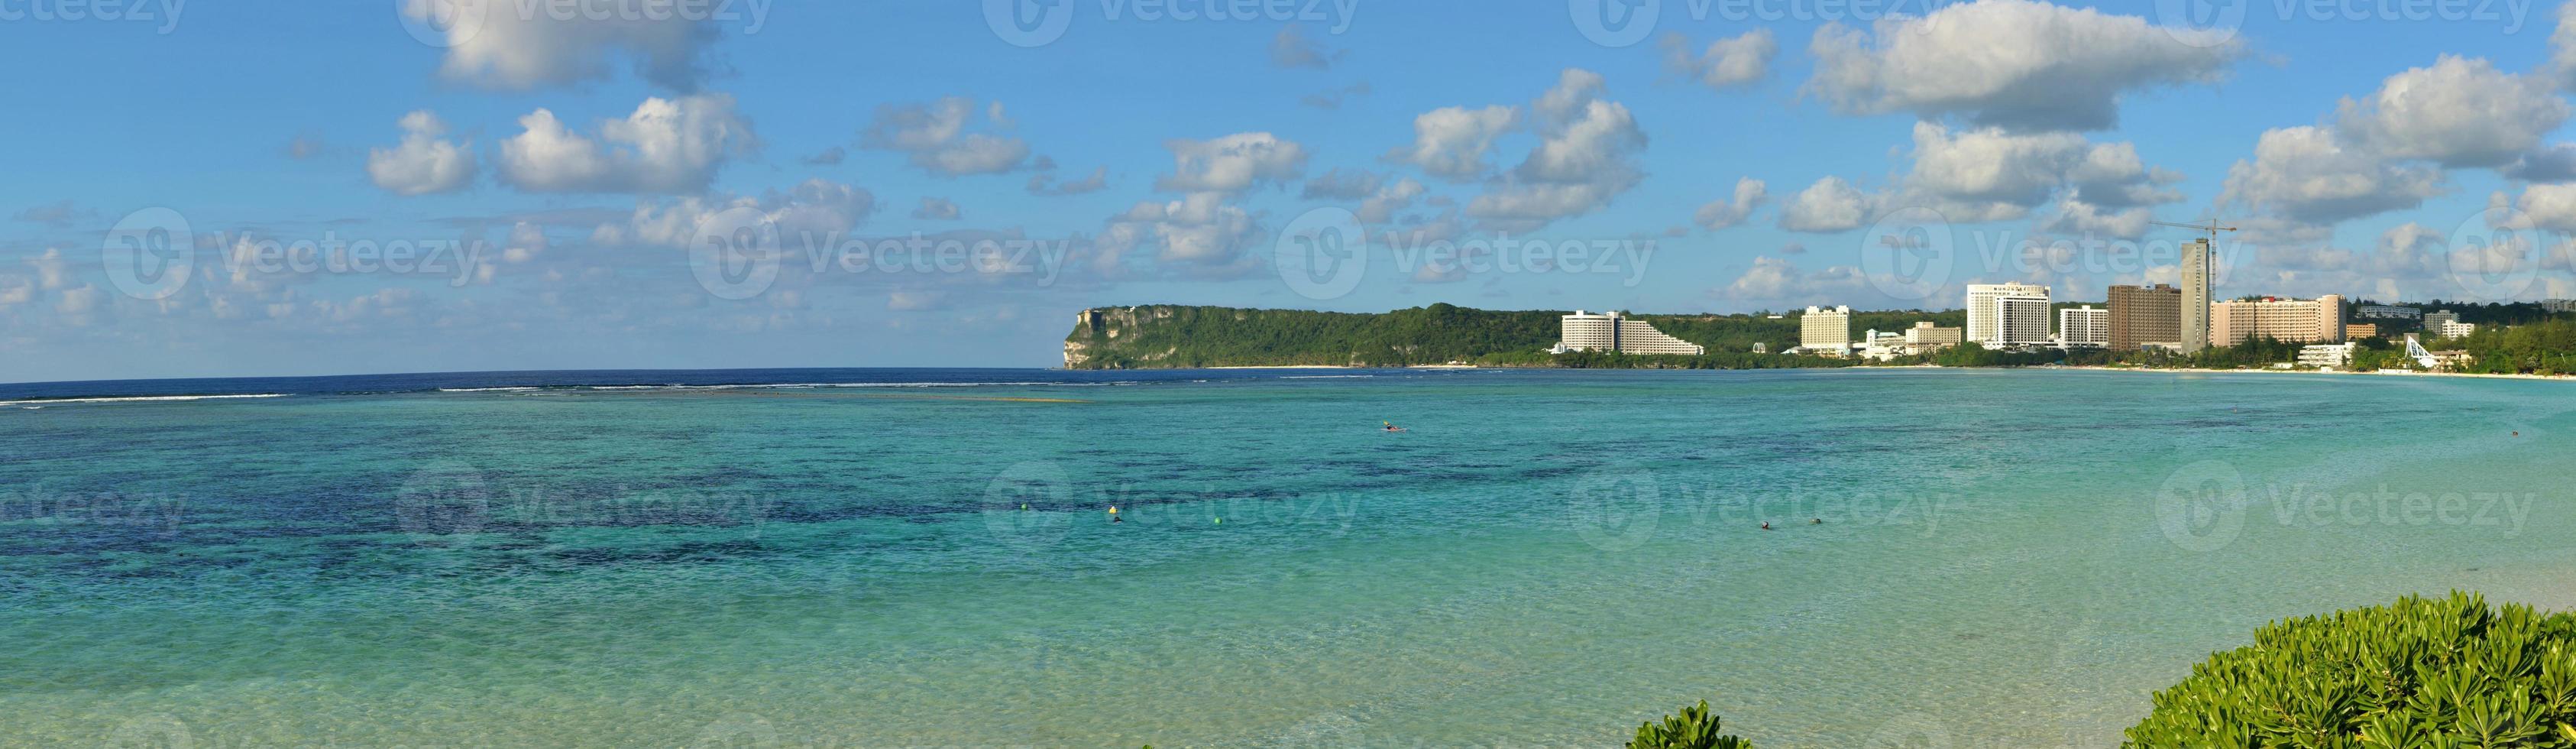 panorama de praia ilha tropical foto